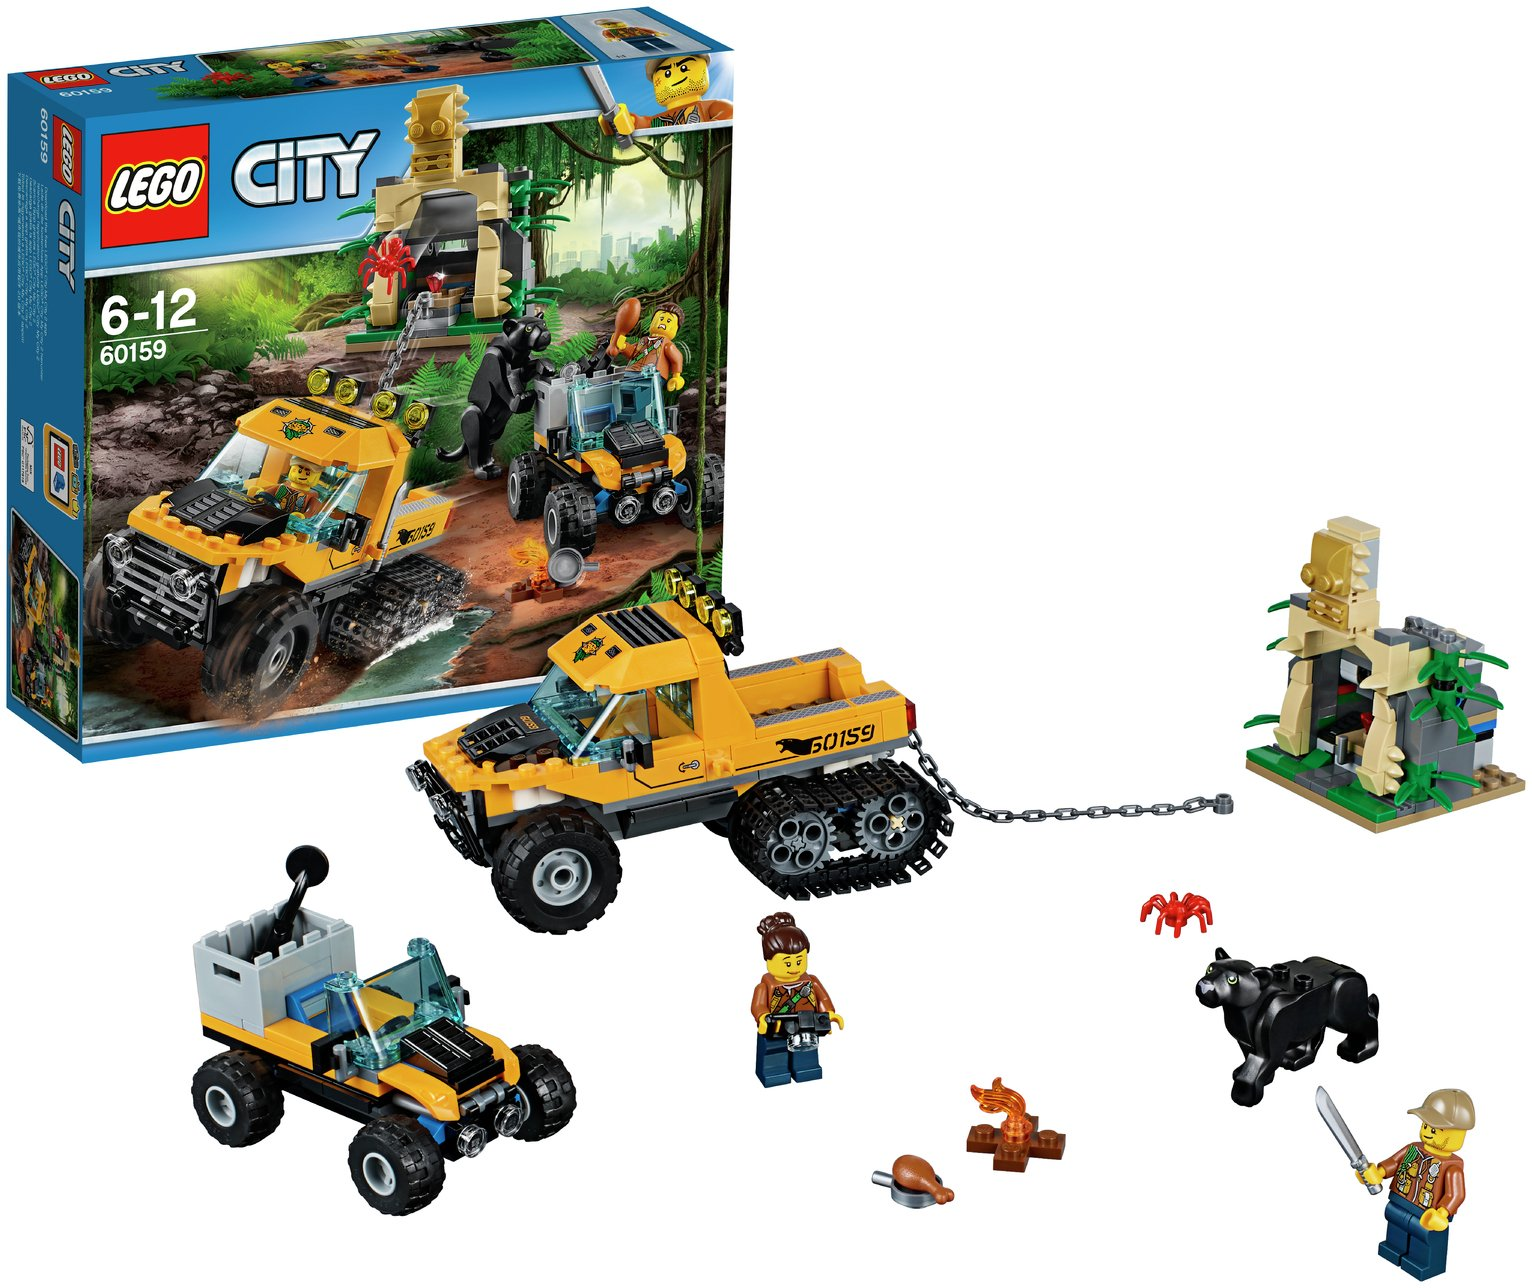 Buy LEGO City Jungle Halftrack Mission - 60159   LEGO   Argos